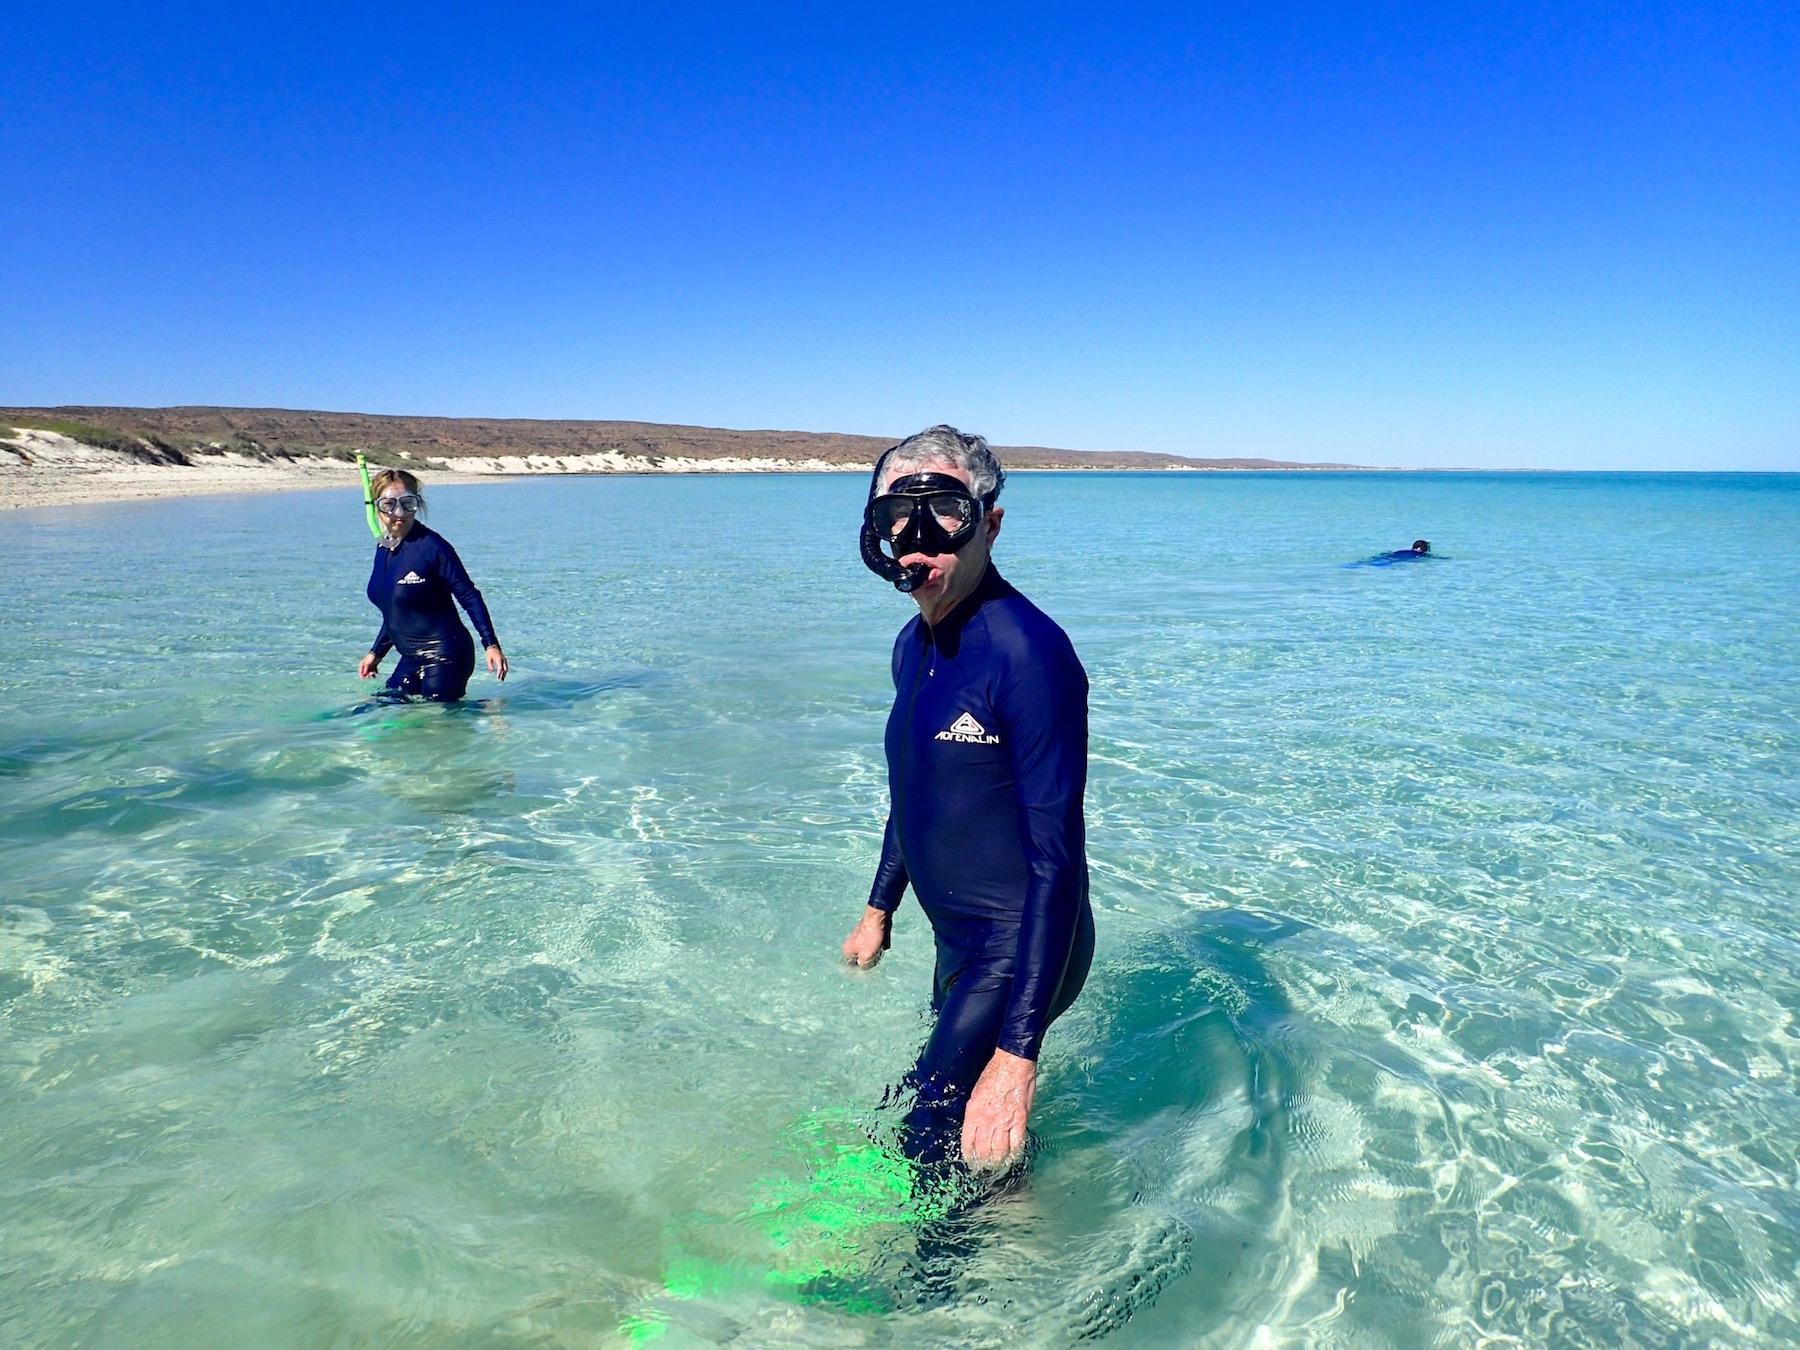 Turquoise Bay, Ningaloo Reef, Snorkel Tour, eco tour, guided tour, Exmouth Adventure Co, Exmouth, Western australia, coral coast, Cape Range National Park